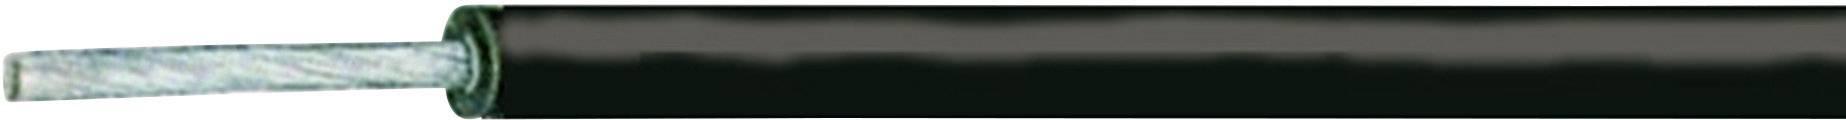 Stikalna žica SiL-SiAF 1 x 2.50 mm, zelena, rumena XBK Kabel cena za meter